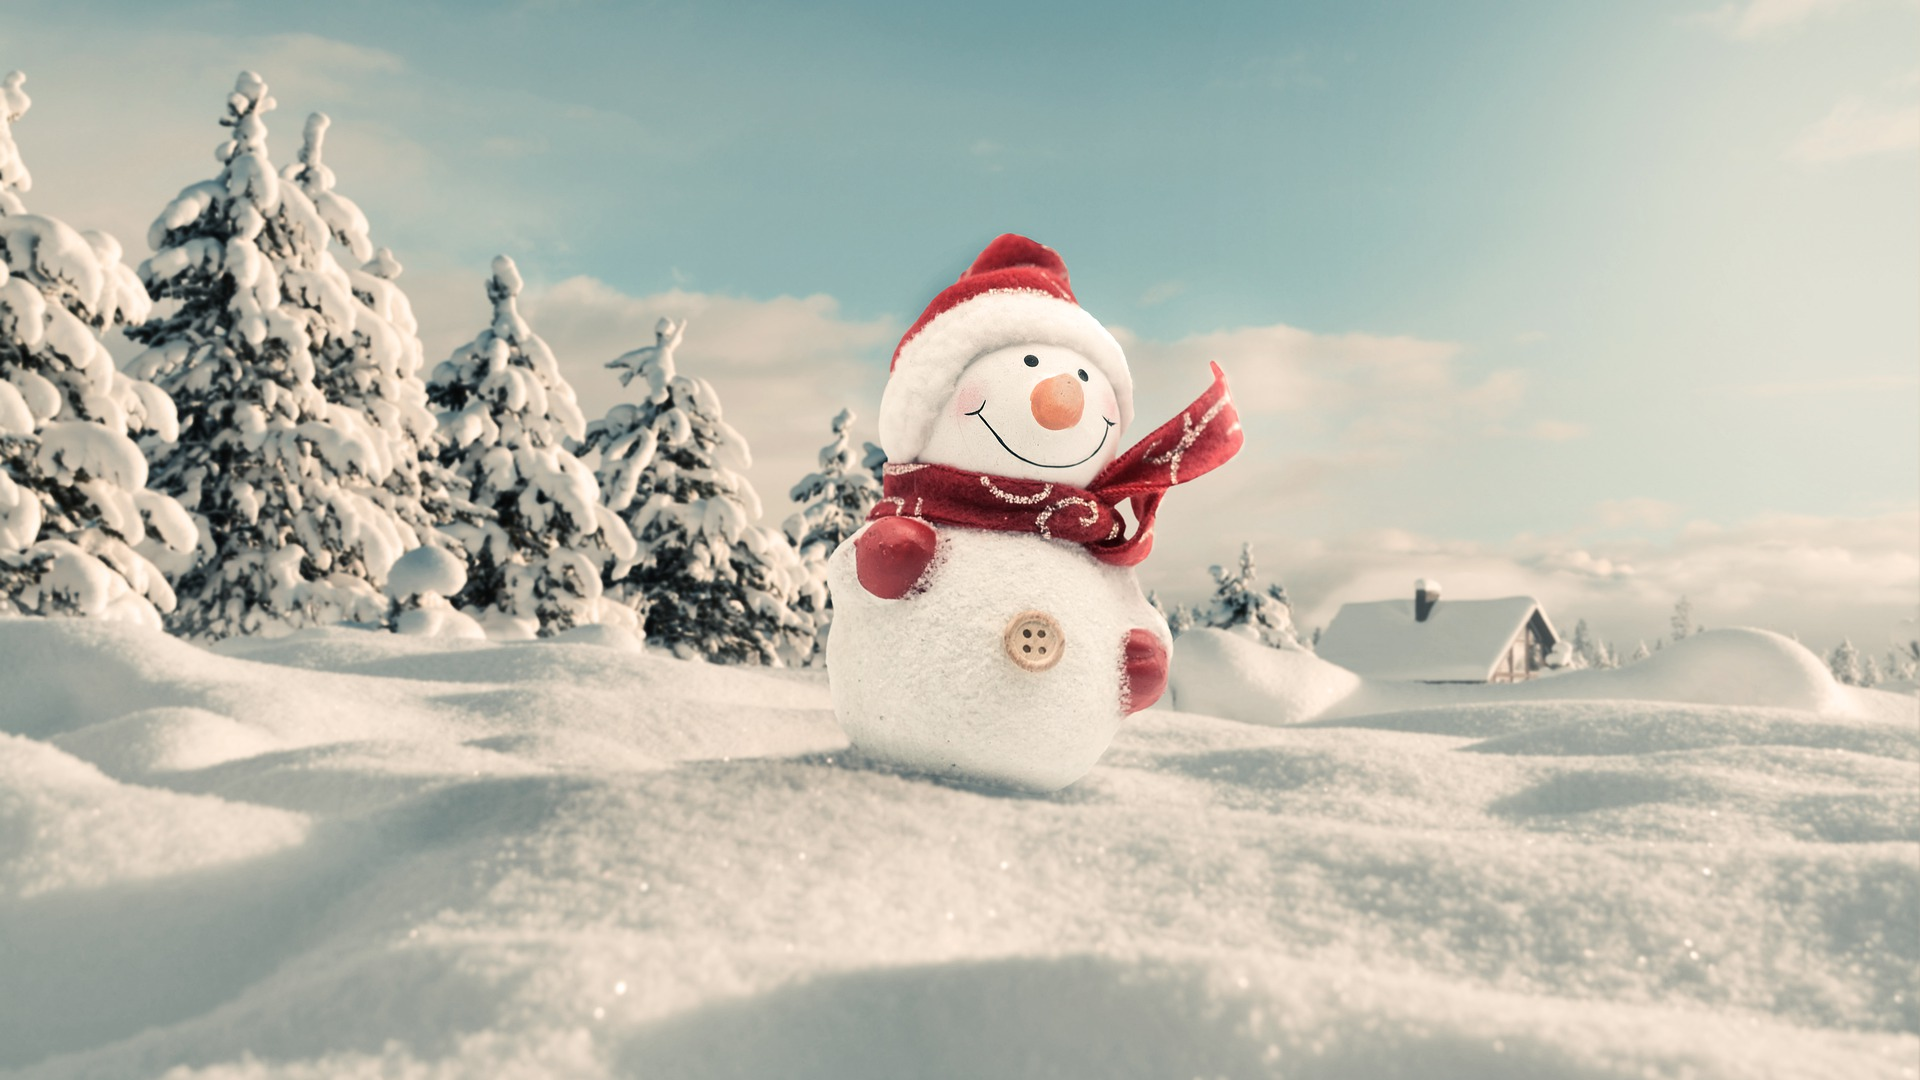 snowman-4663395_1920